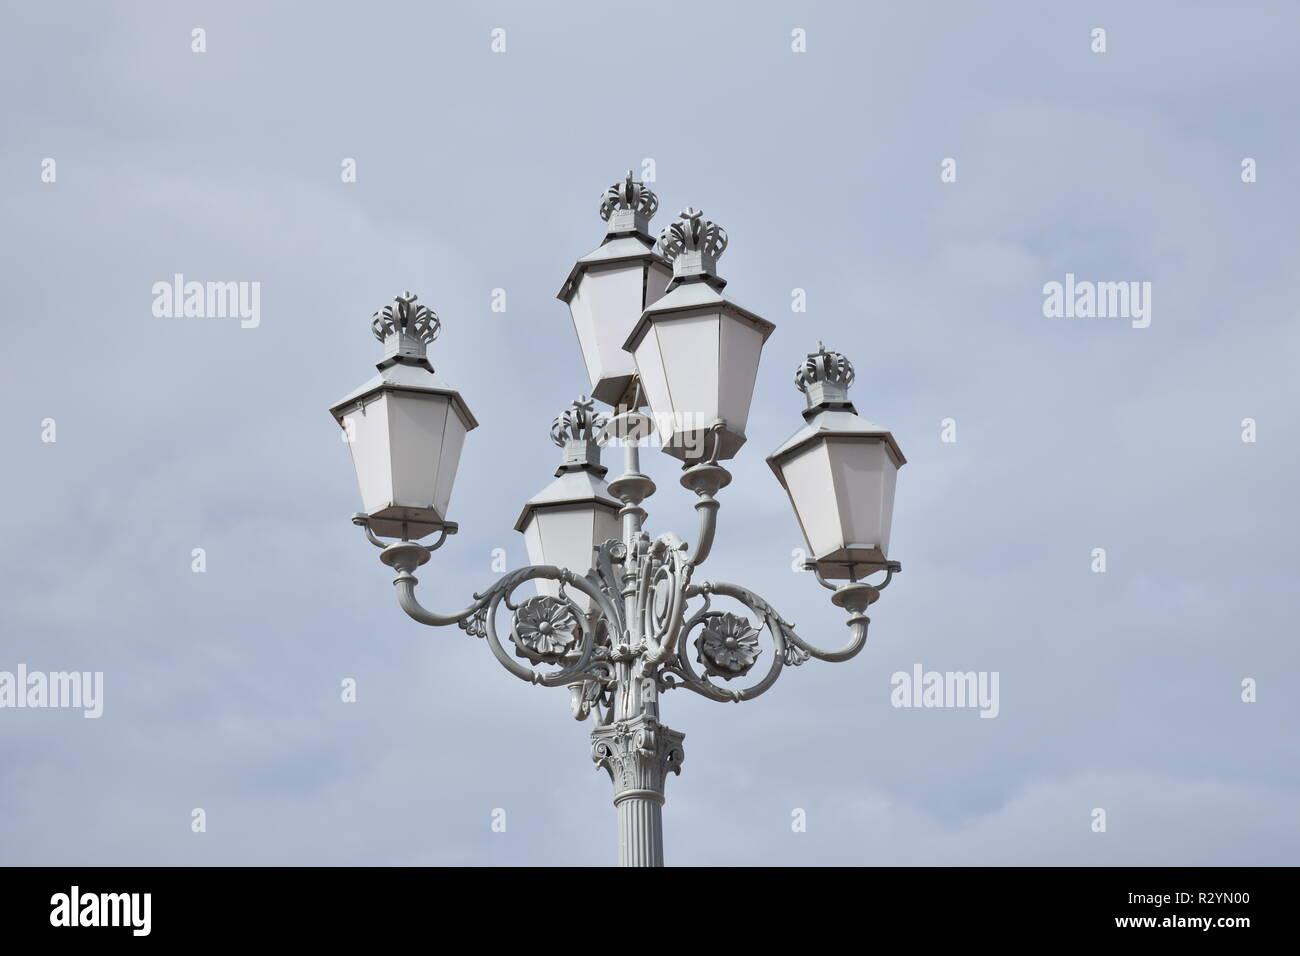 Norwegen, Oslo, Straßenlaterne, Kandelaver, historisch, Licht, Beleuchtung, Lampe, Schloss, Königliches Schloss, Park, Schlosspark, Tradition, Tradit Stockbild